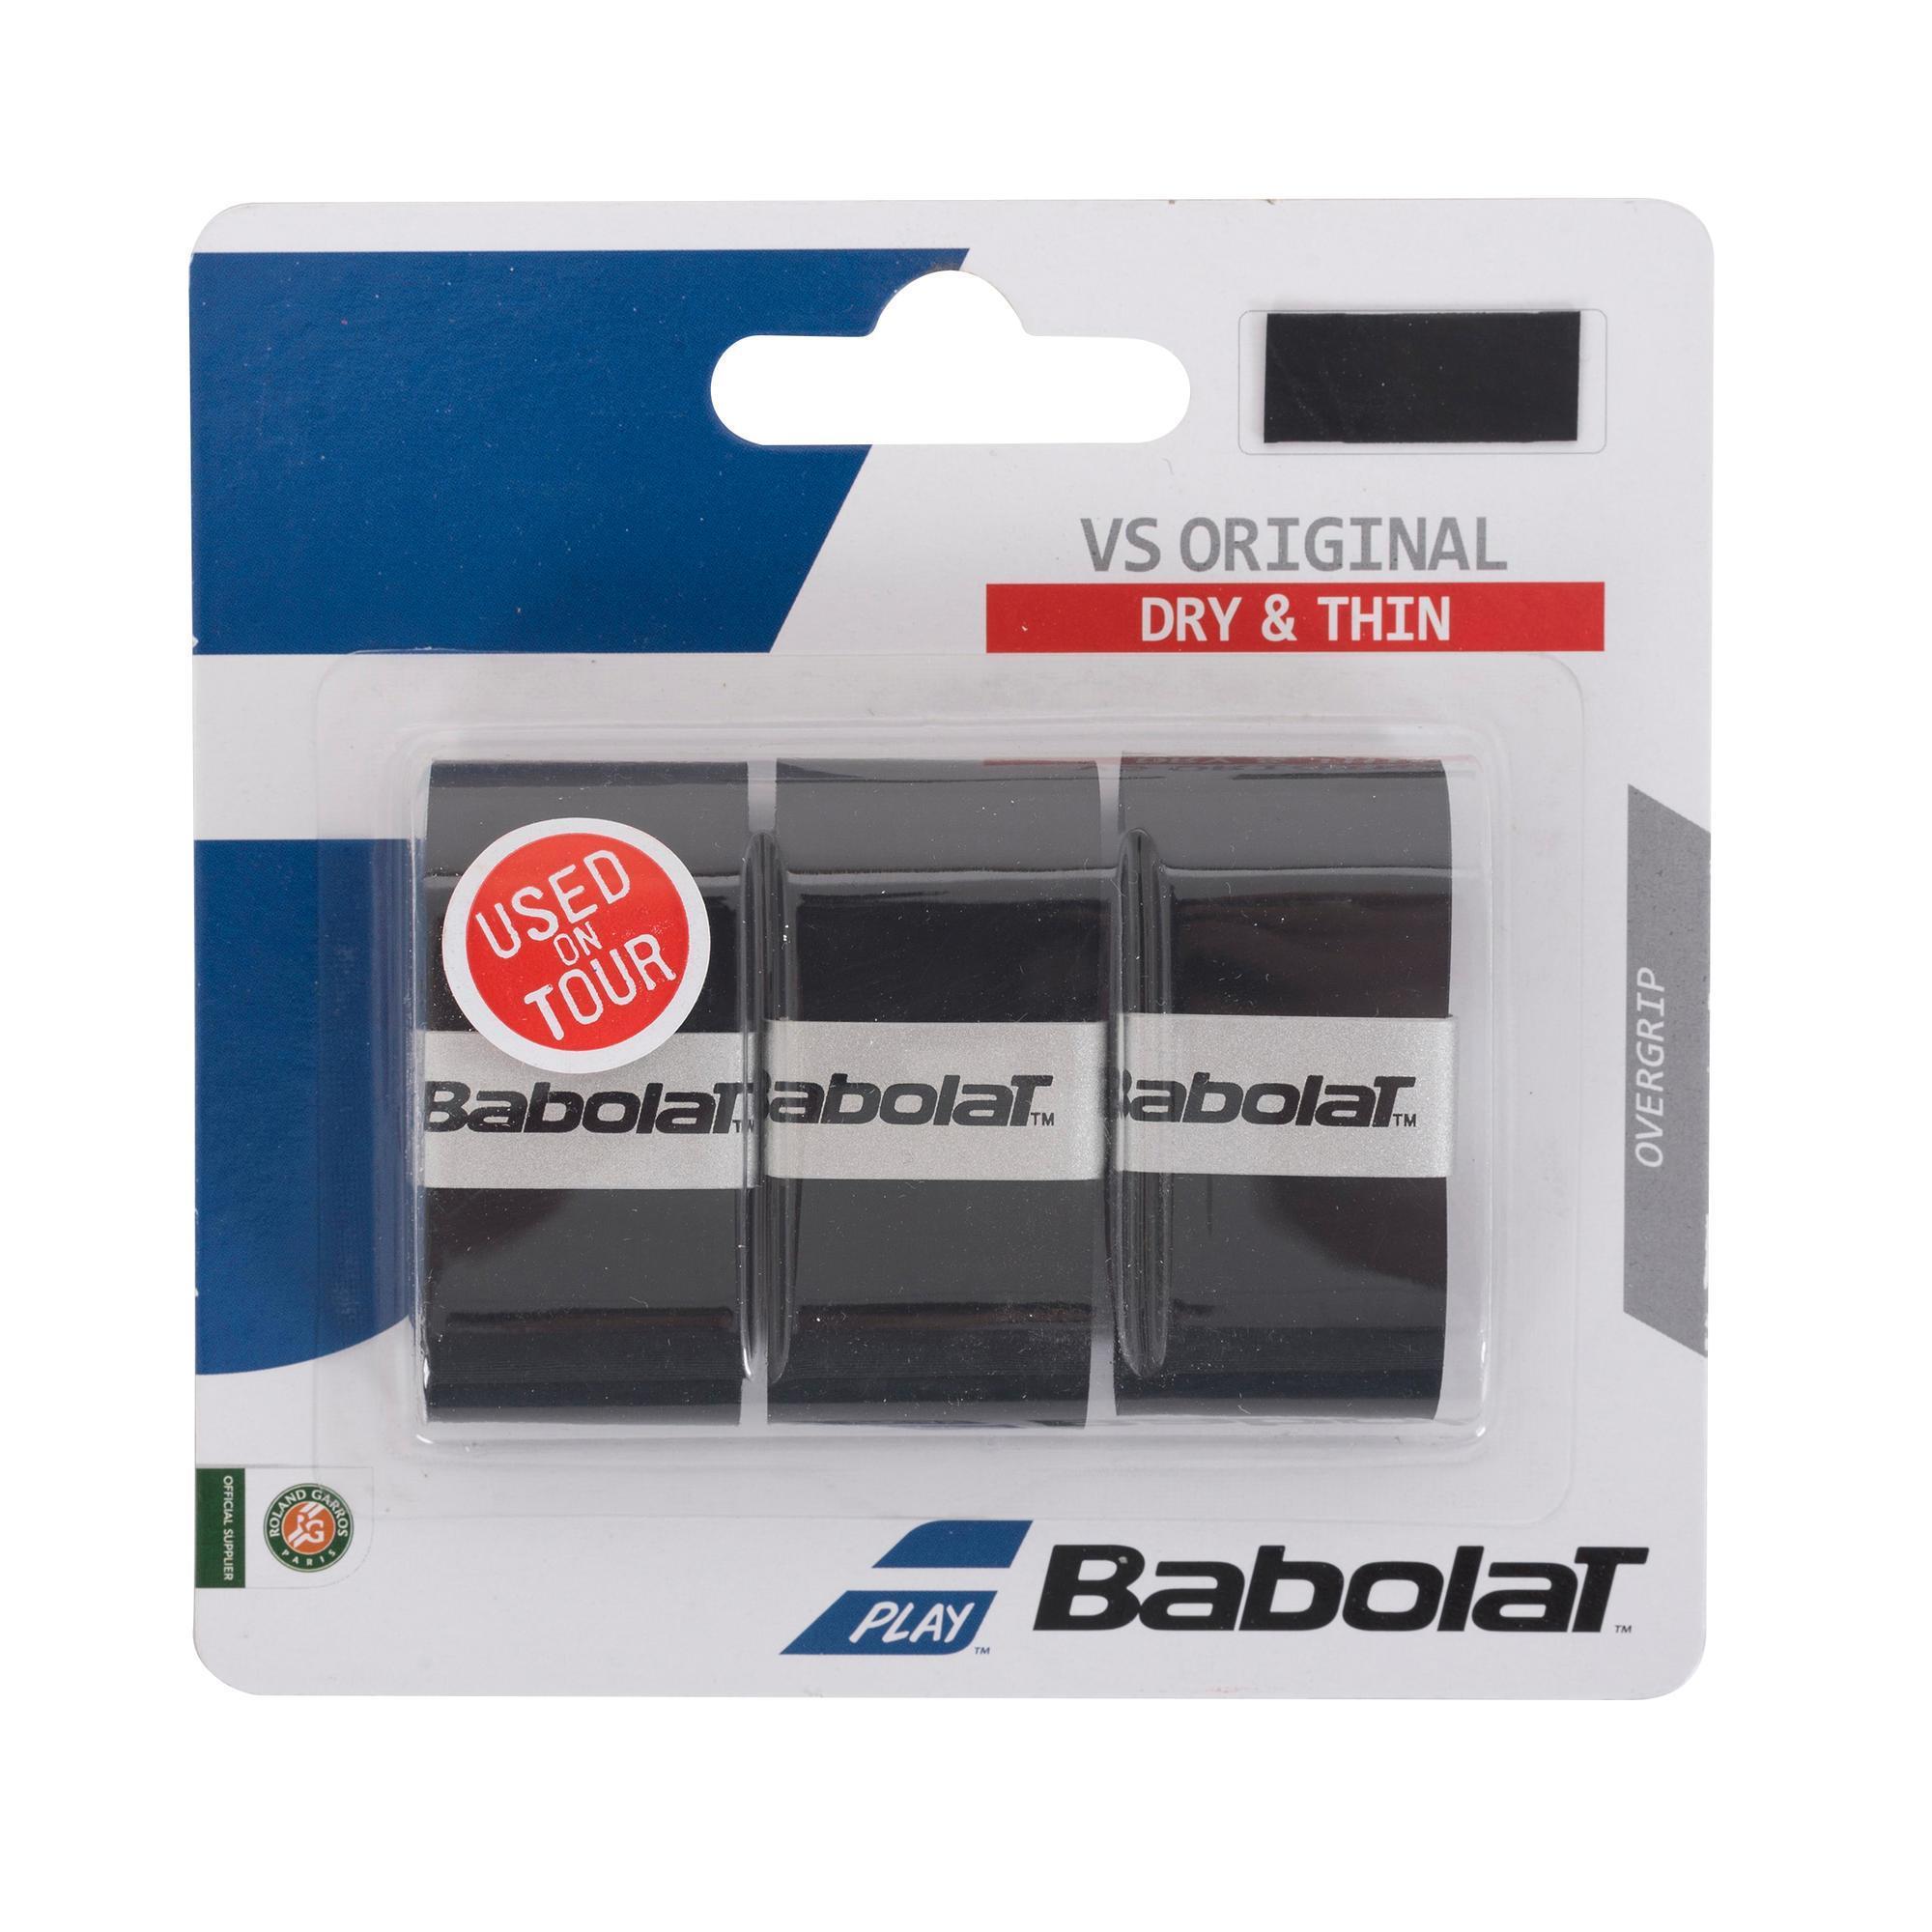 Babolat Tennisgrip overgrip VS Original zwart kopen